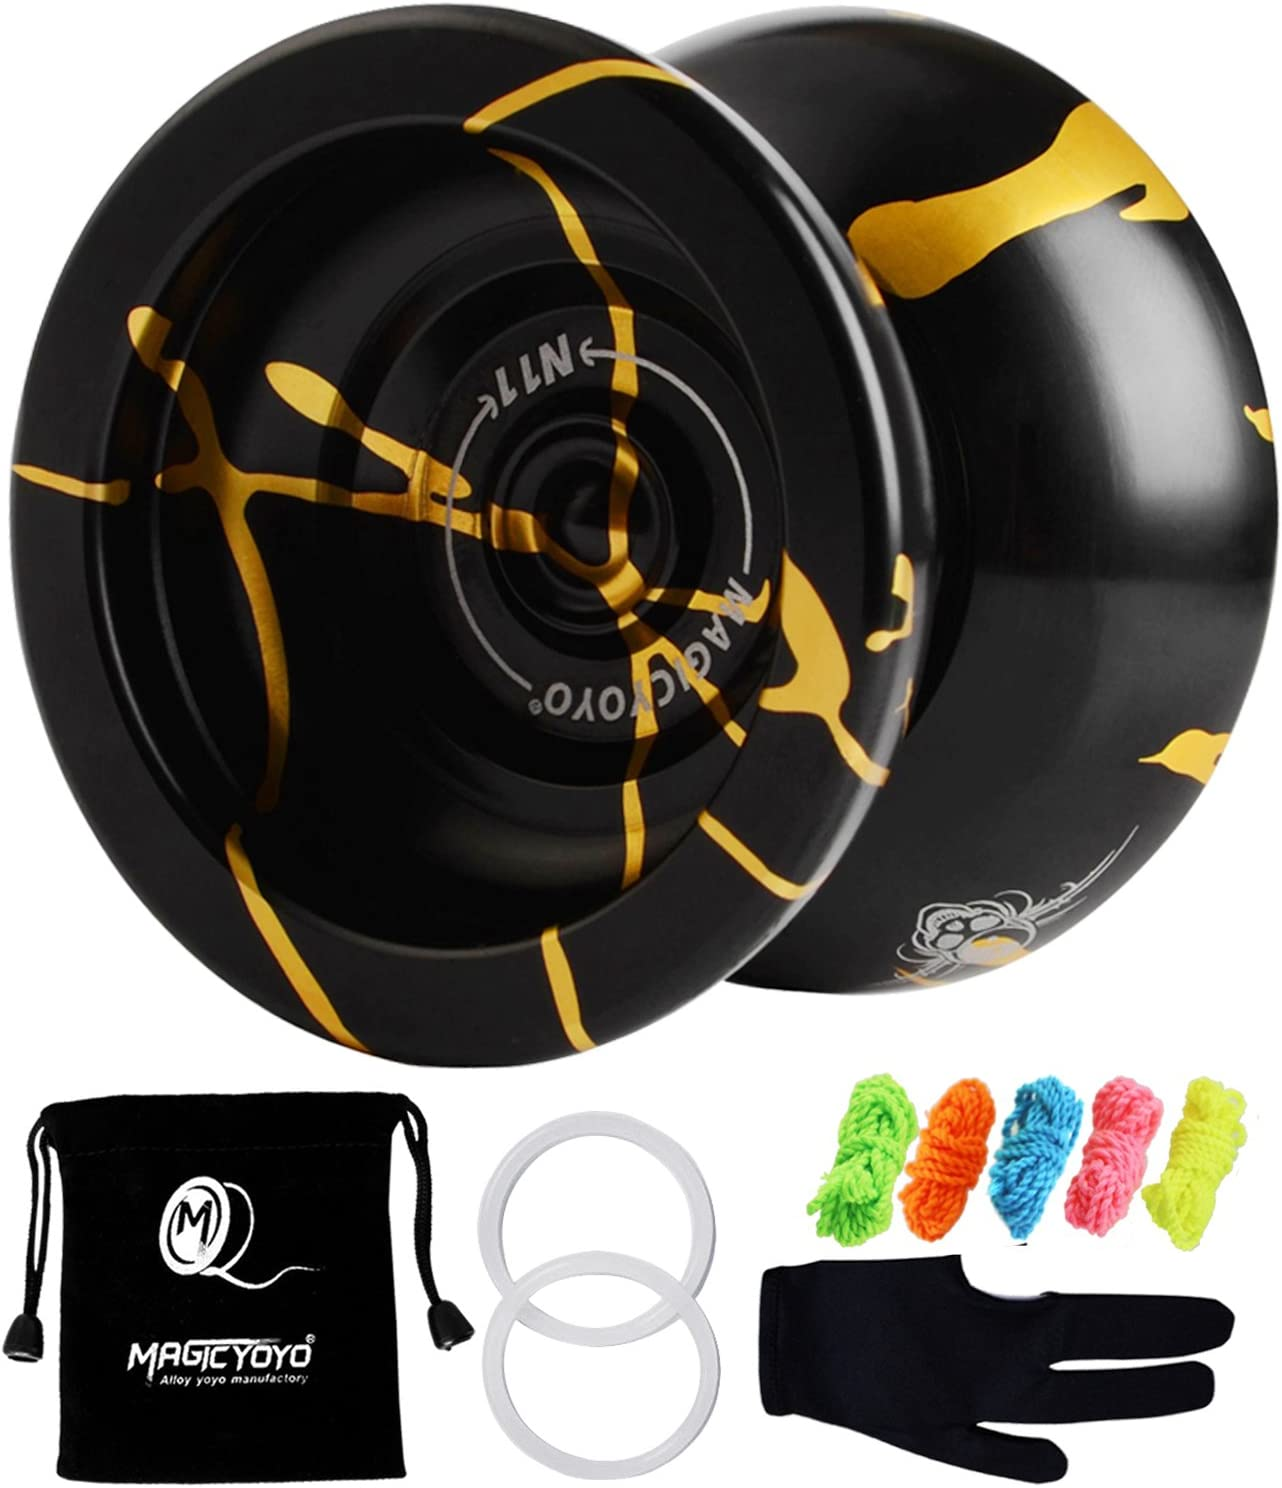 Black ... MAGICYOYO N11 Alloy Aluminum Professional Yoyo Unresponsive YoYo Ball